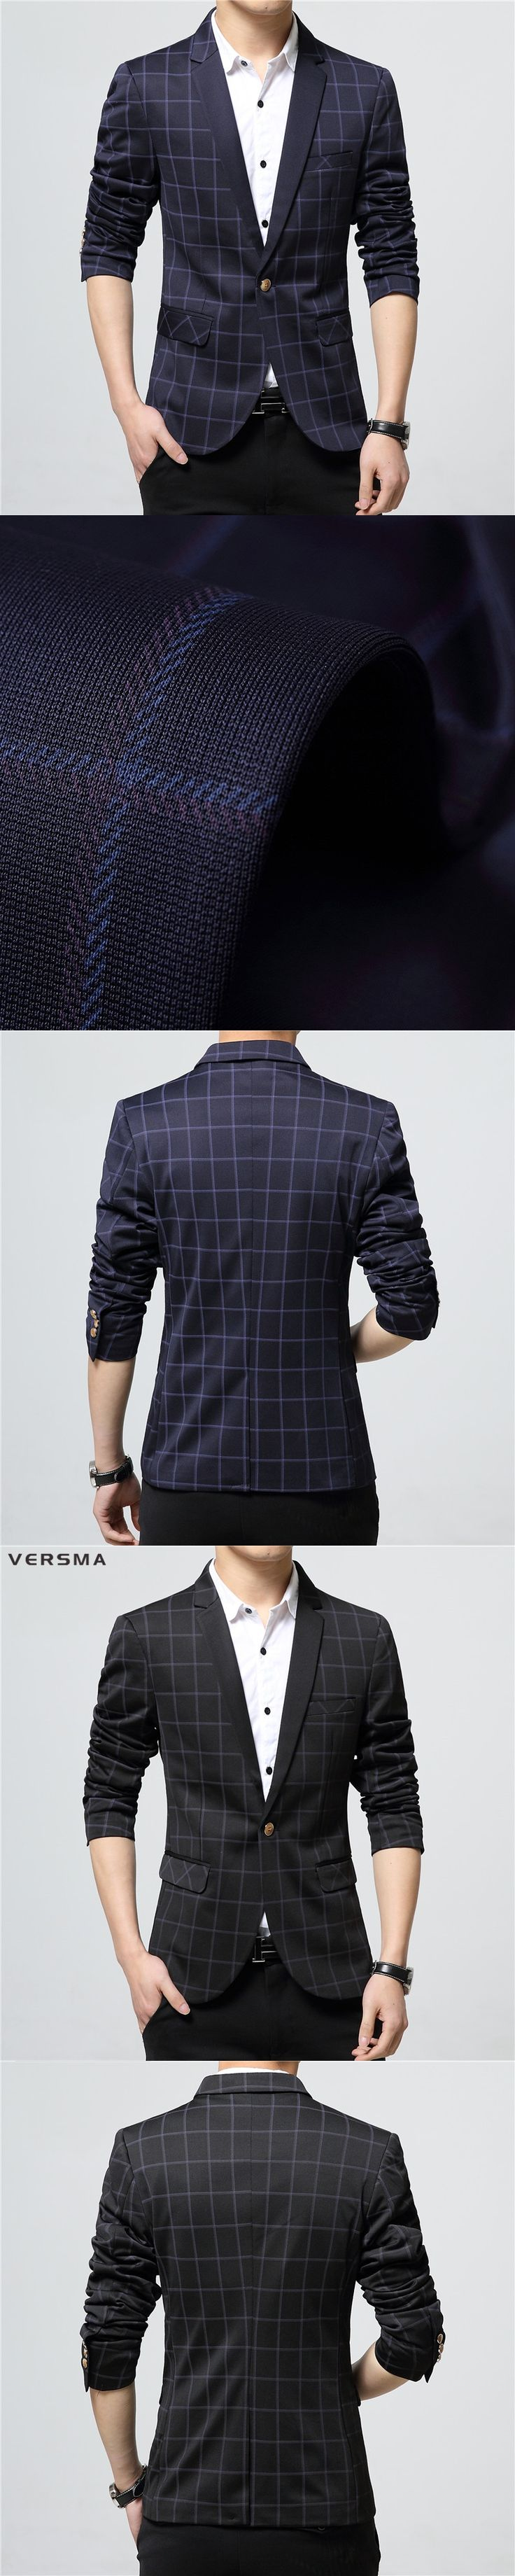 VERSMA 2017 British Slim Fit Blazer Men Designs Plaid Stylish Suits Blazers Brand Mens Formal Royal Blue Blazer Suit Jacket 3XL